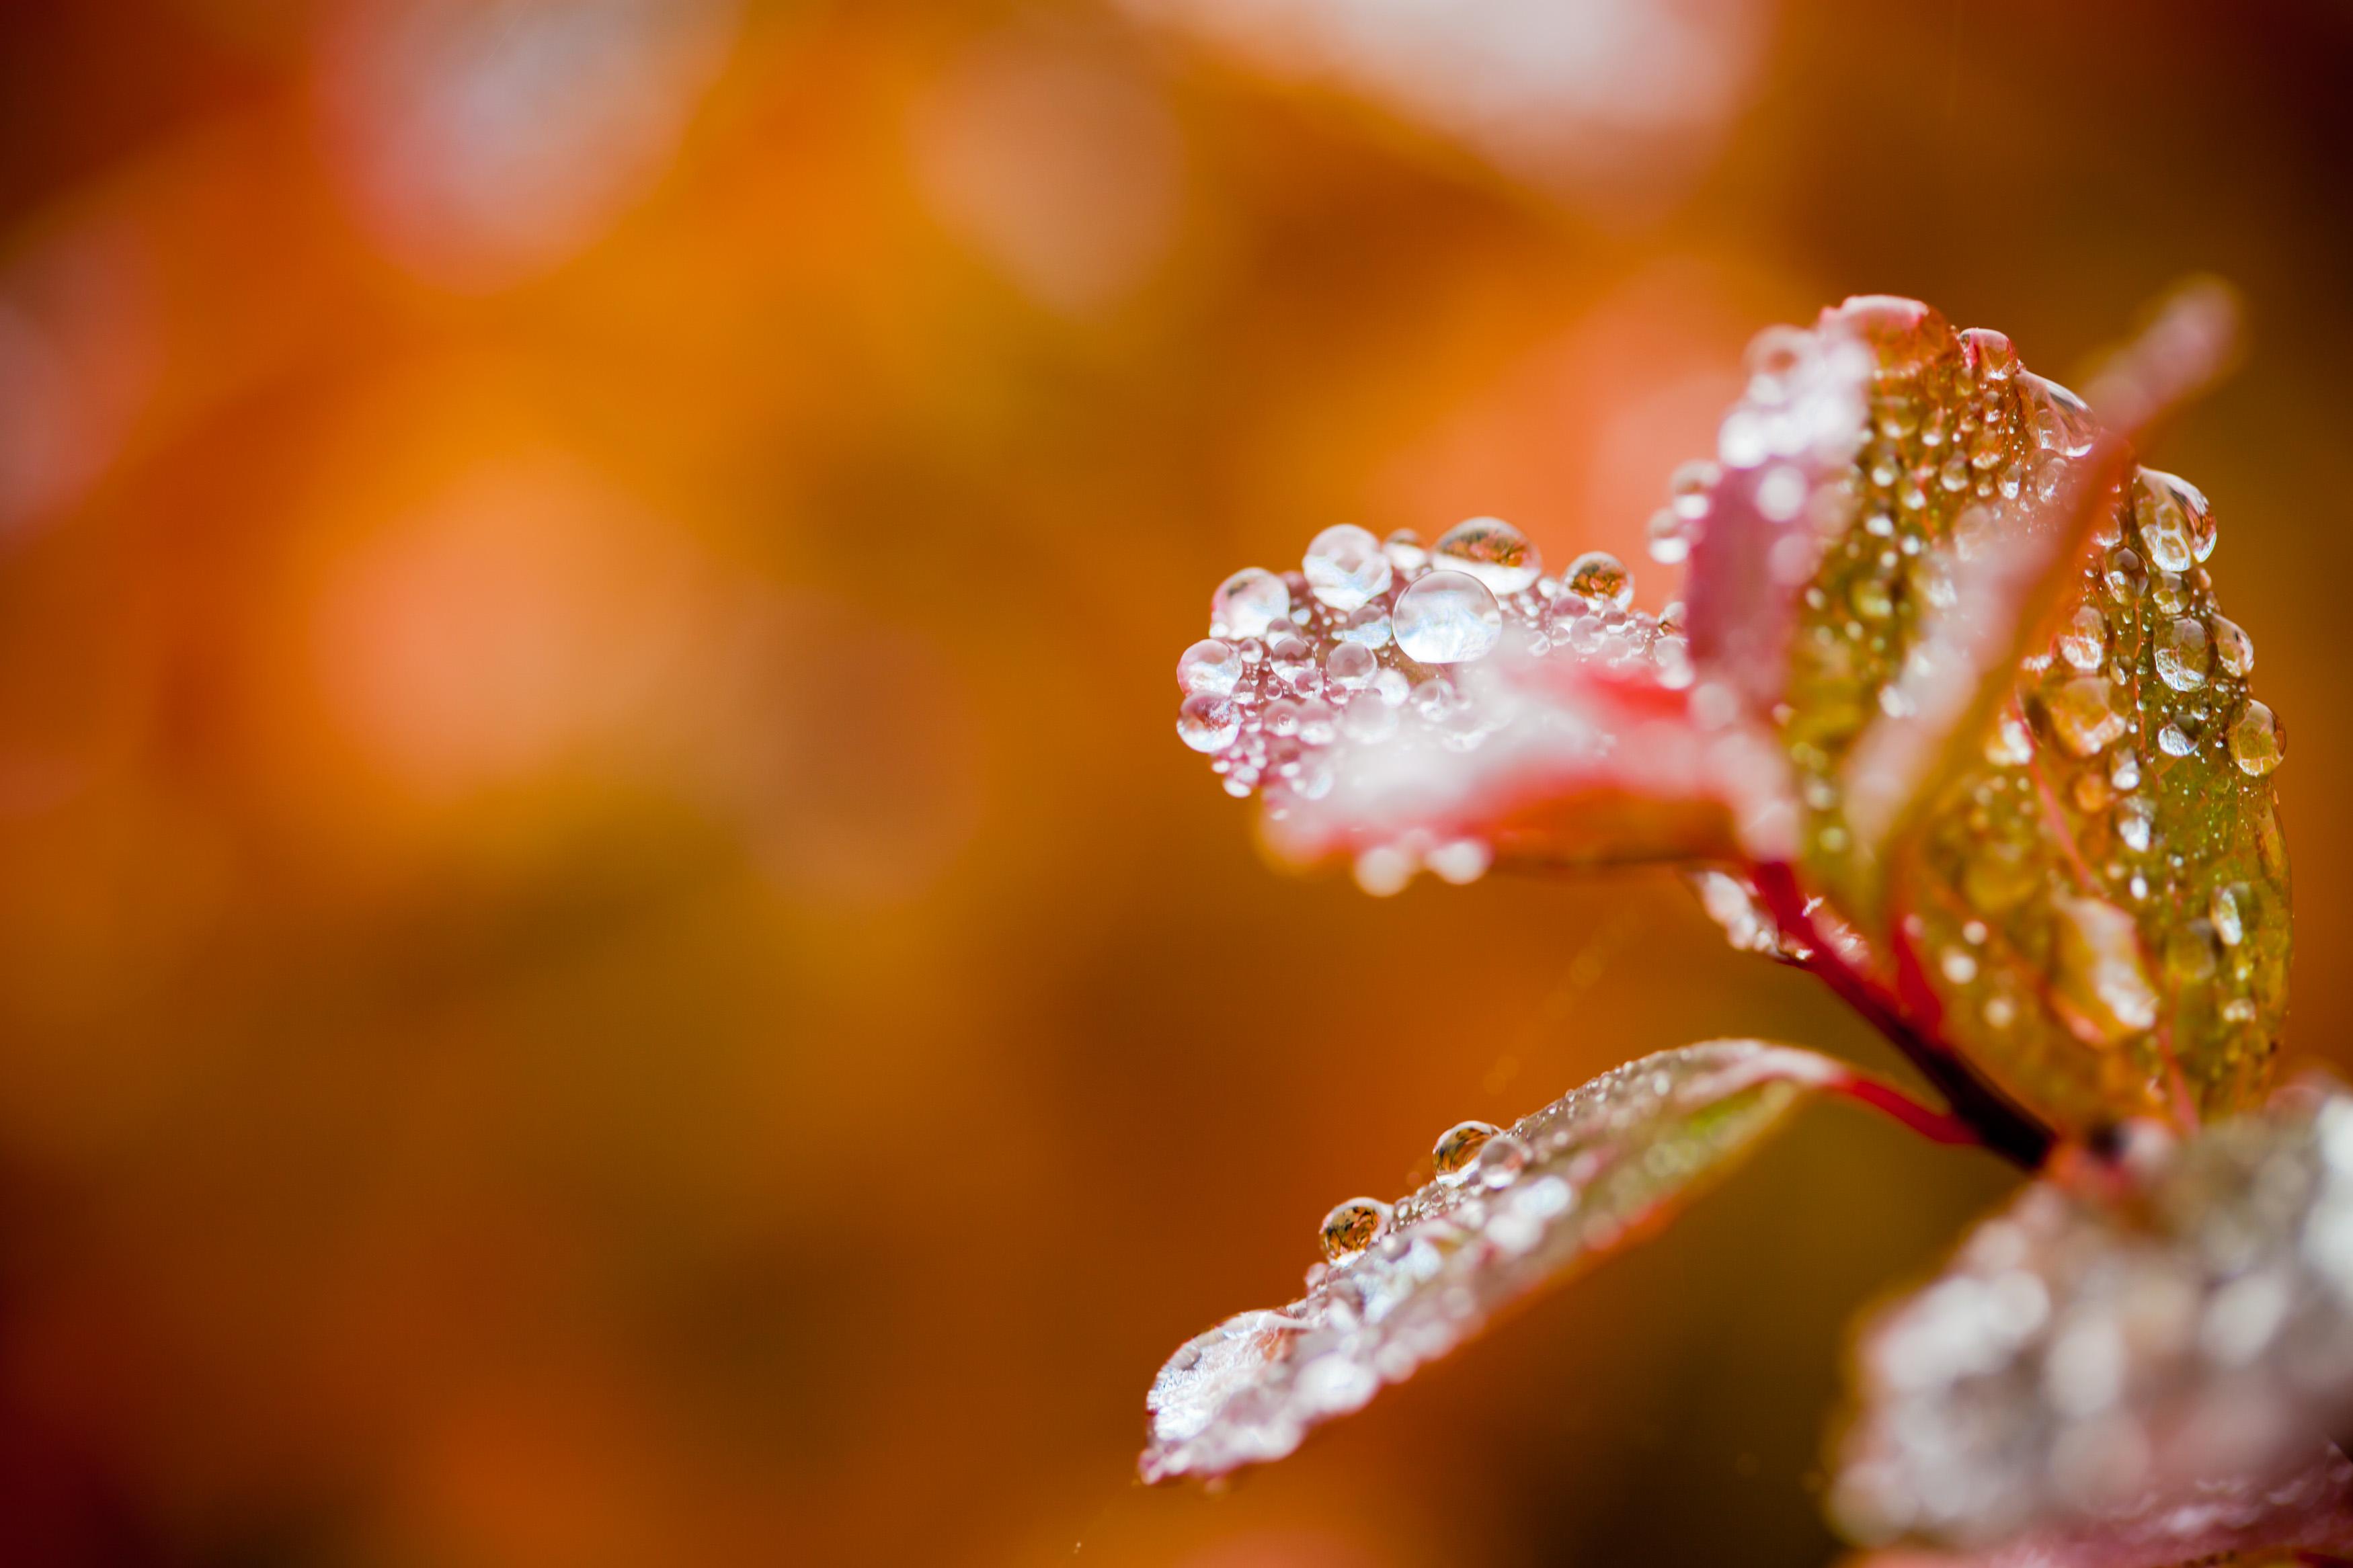 Droplets on autumn foliage photo